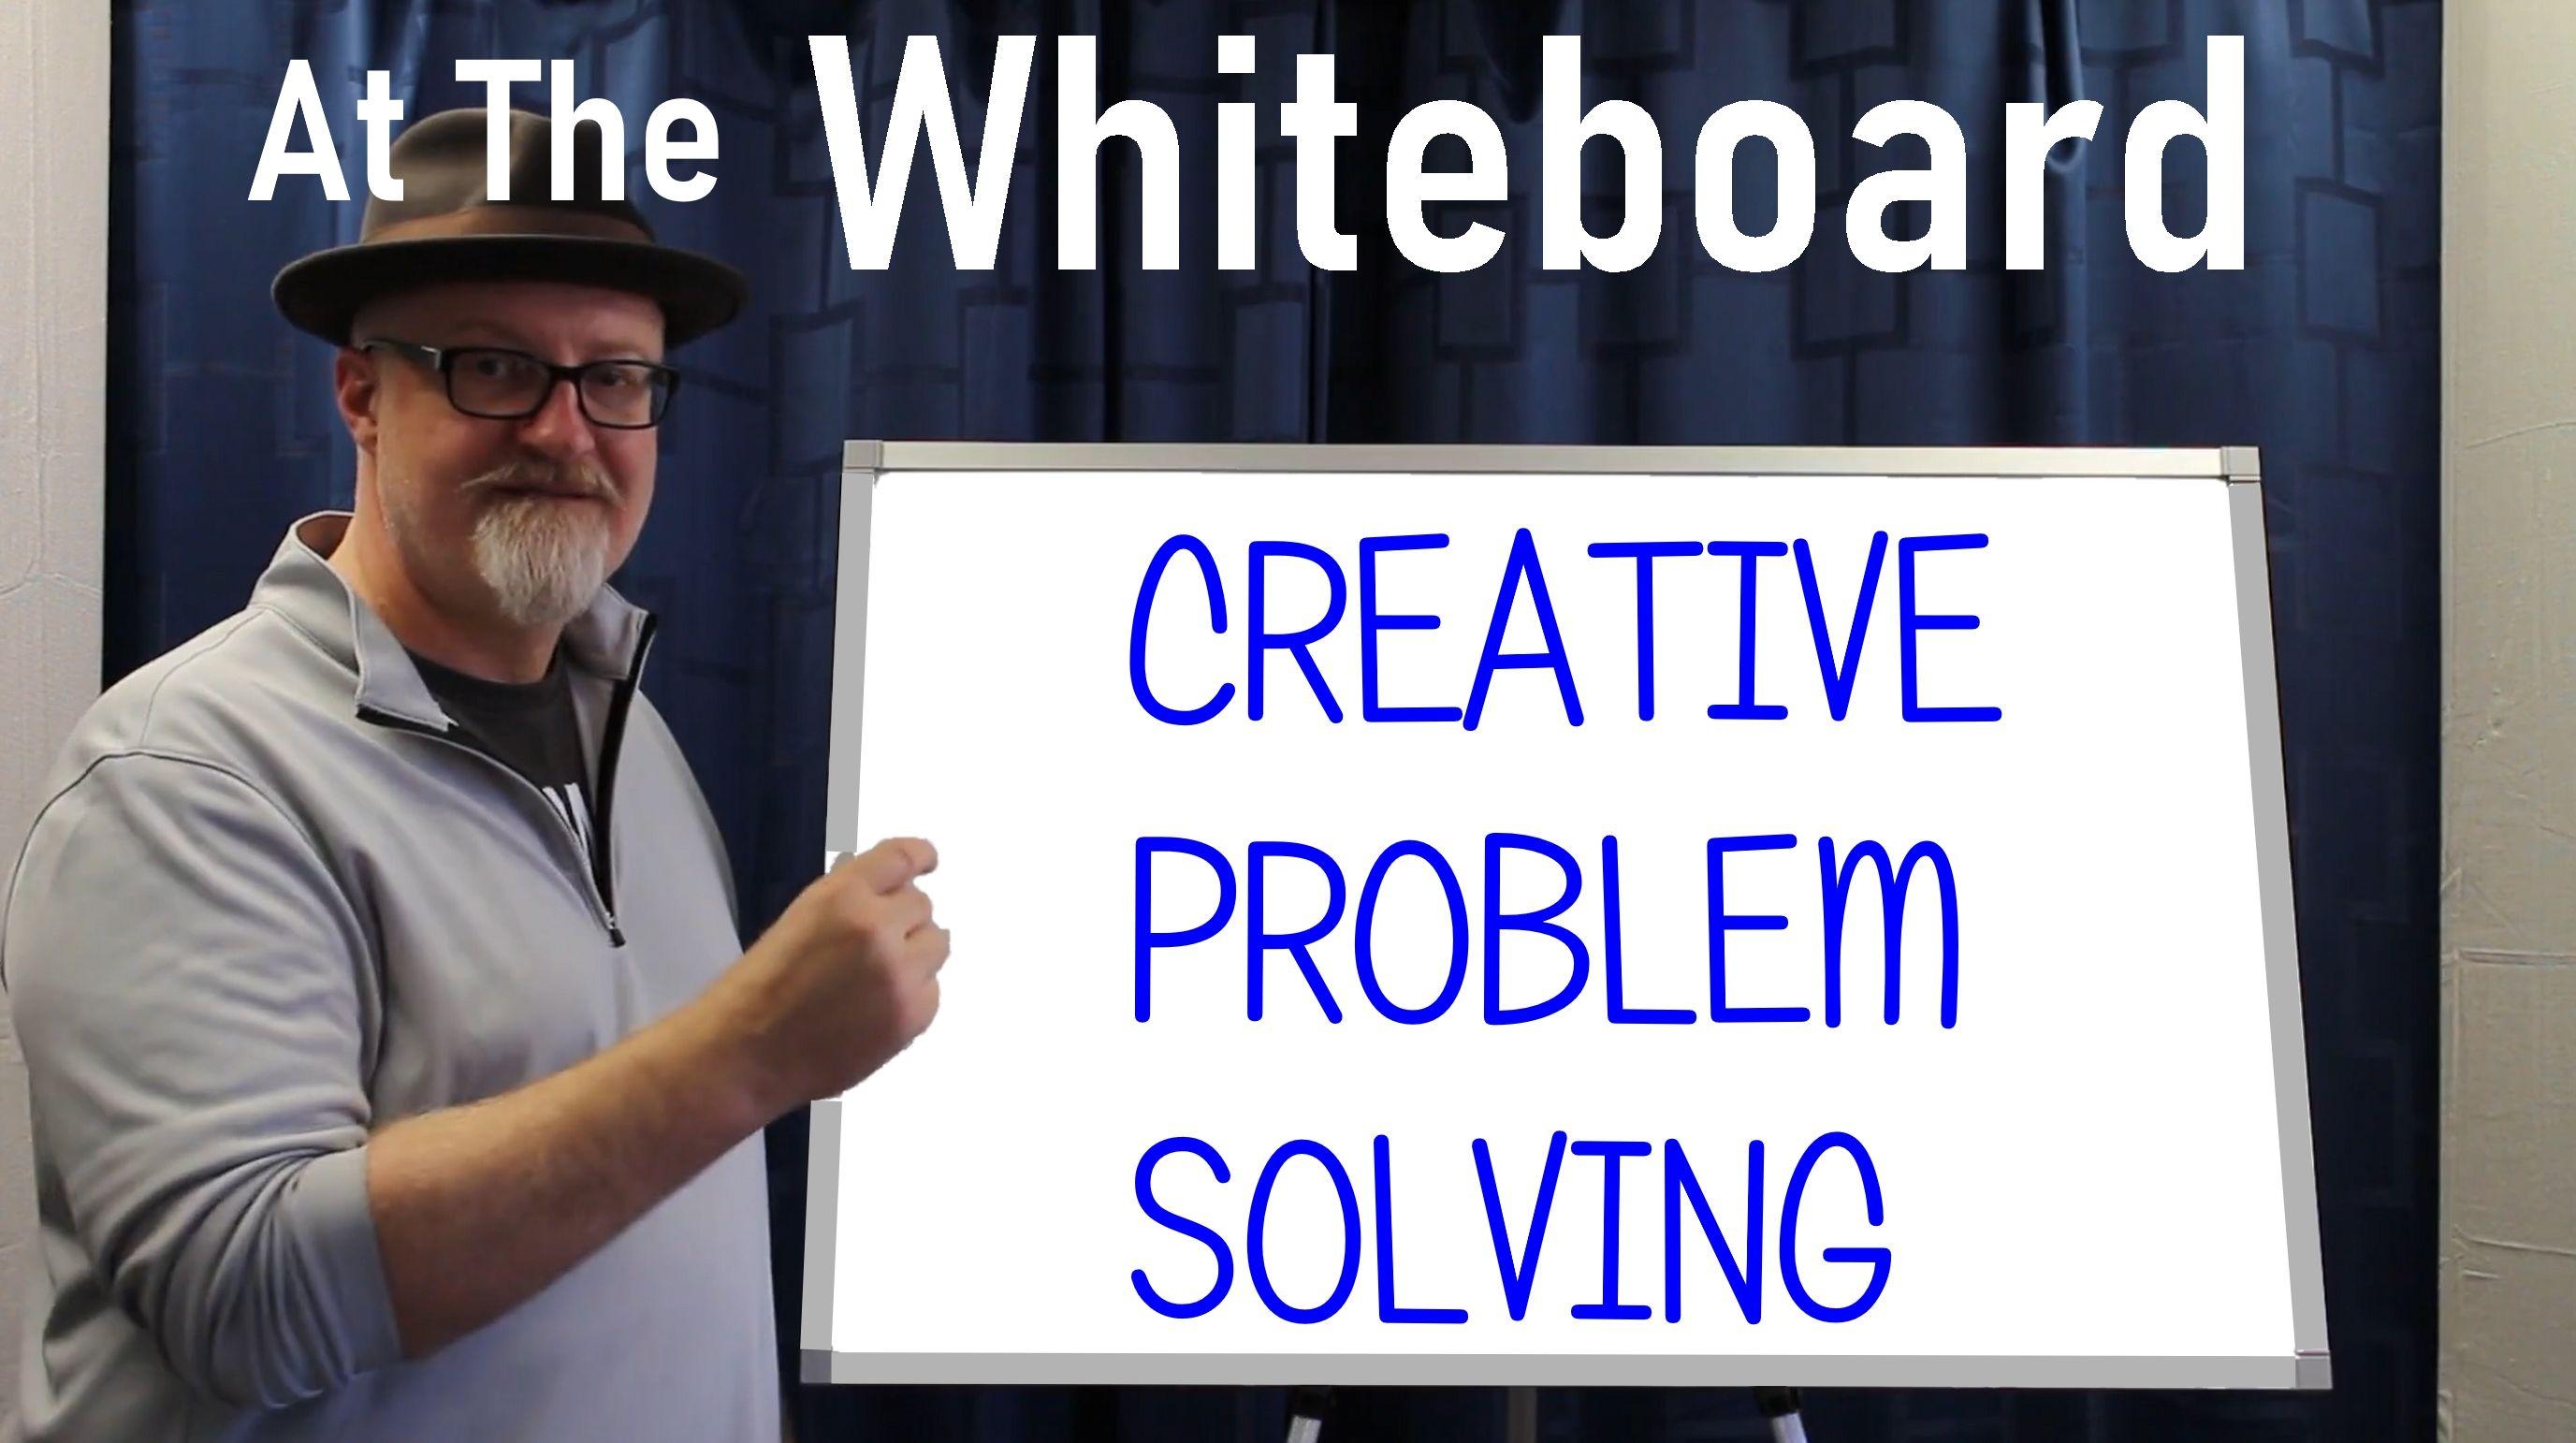 WHITE BOARD CREATIVE PROBLEM SOLVING